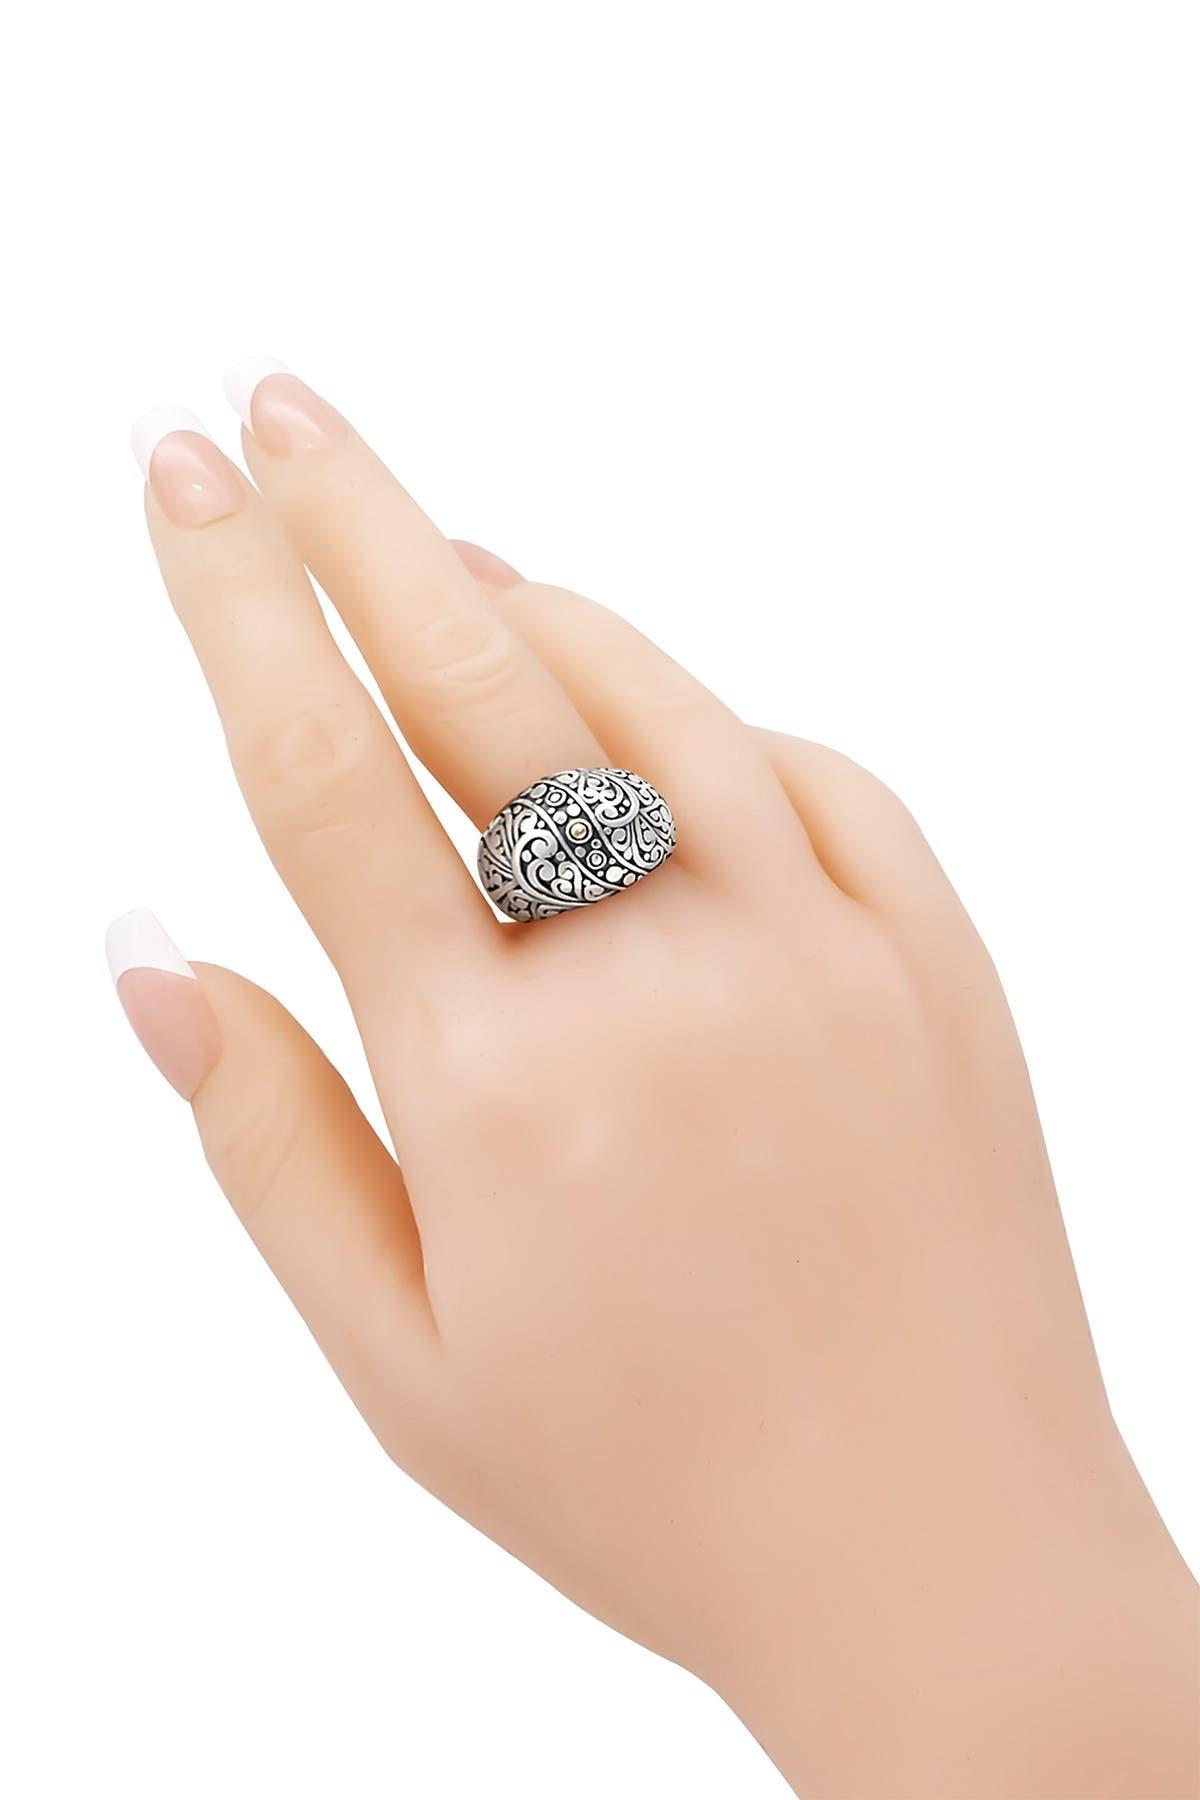 Image of DEVATA Sterling Silver & 18K Gold Filigree Dome Ring